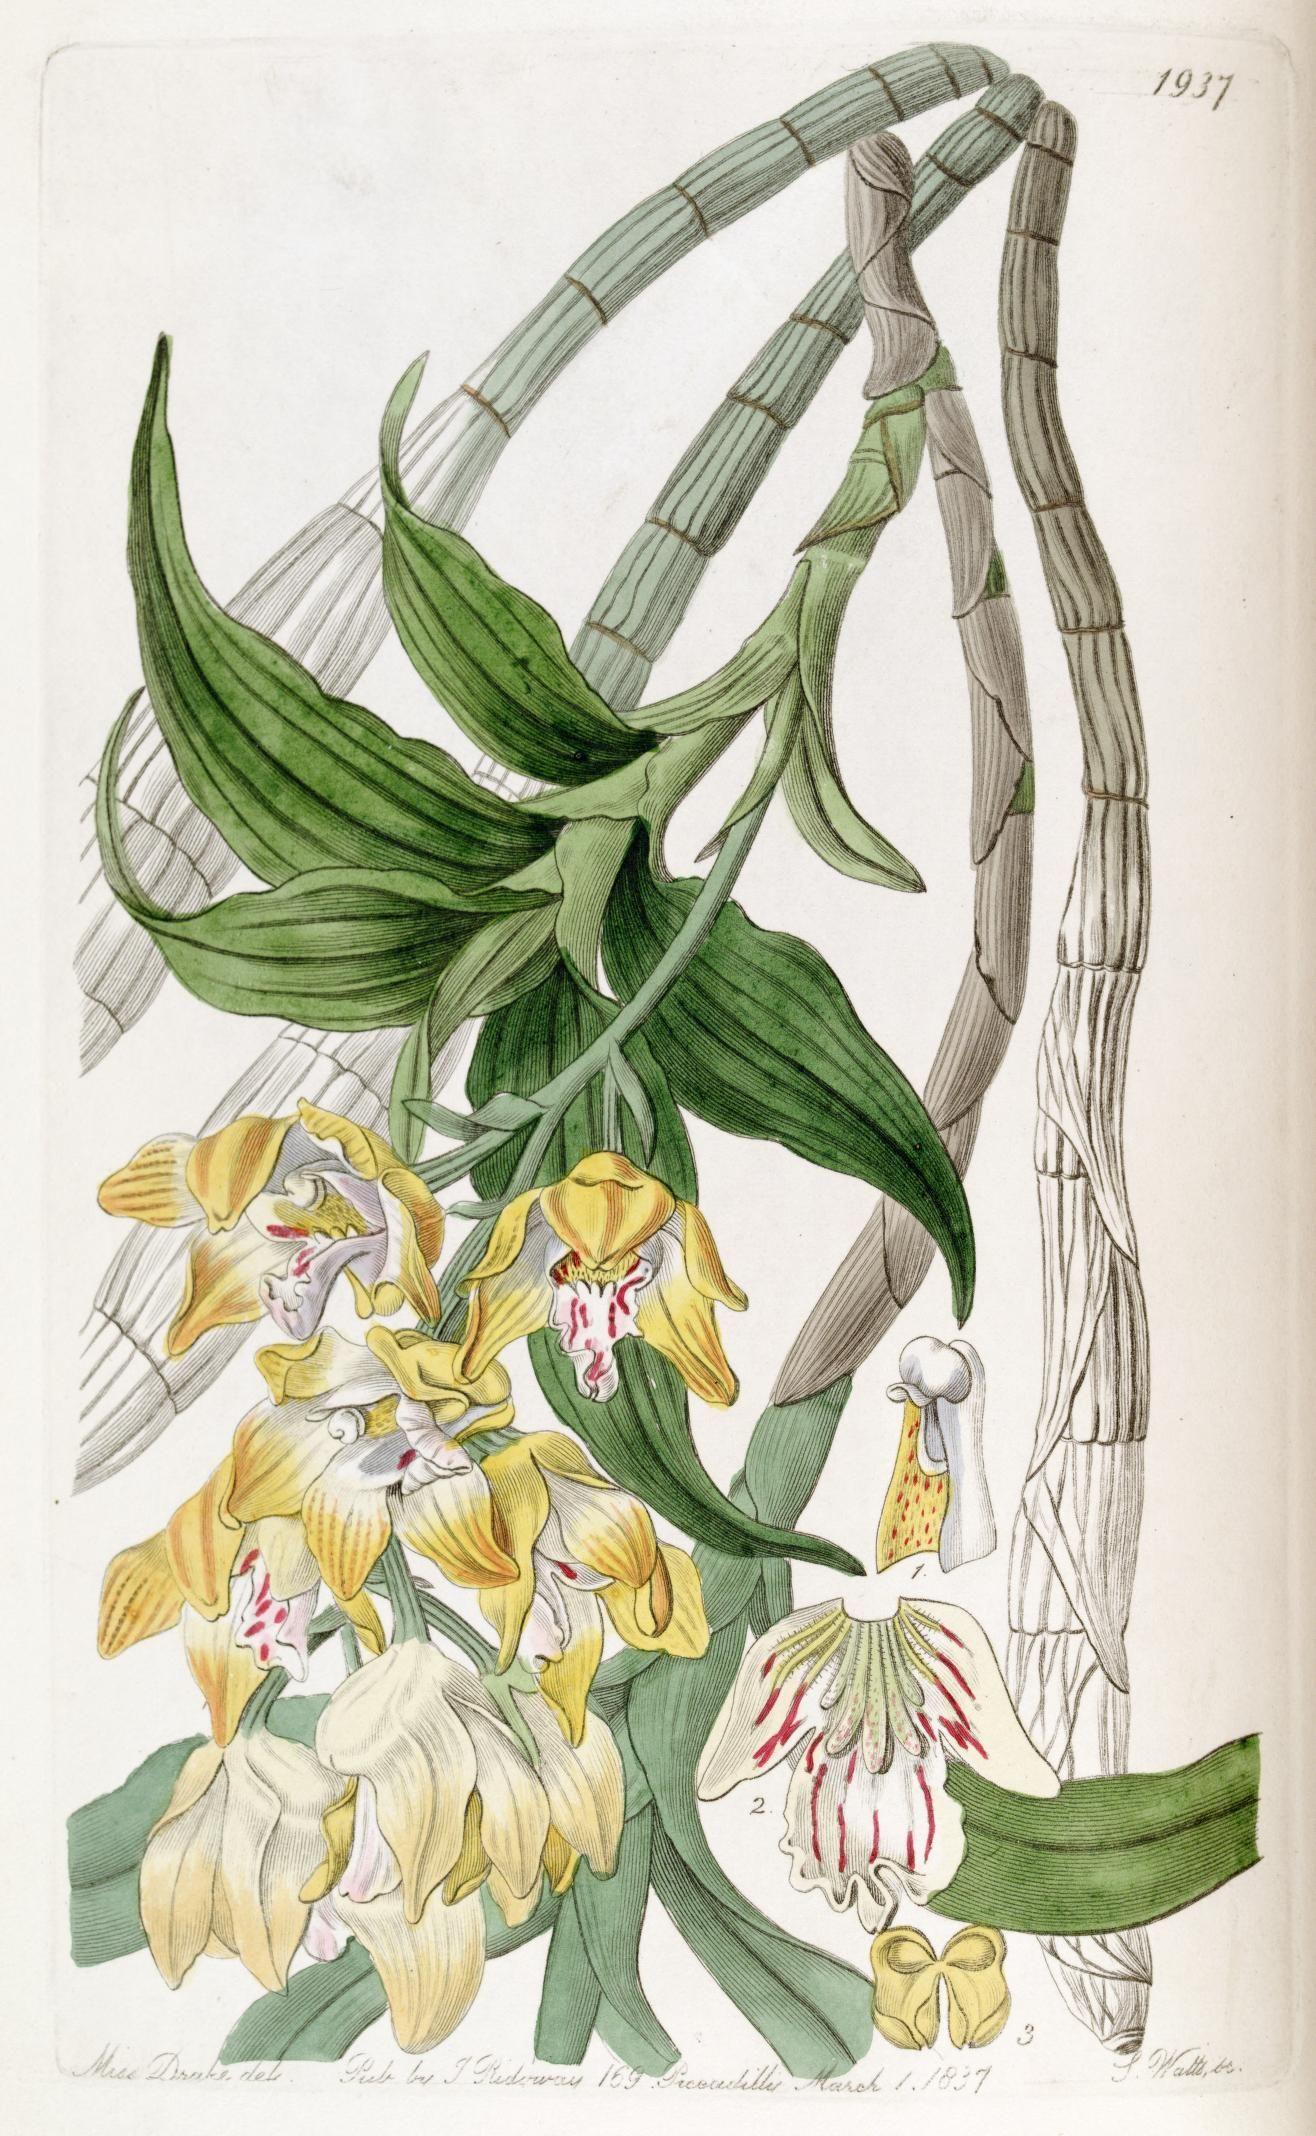 v. 23 (1837) - Edwards's botanical register. - Biodiversity Heritage Library